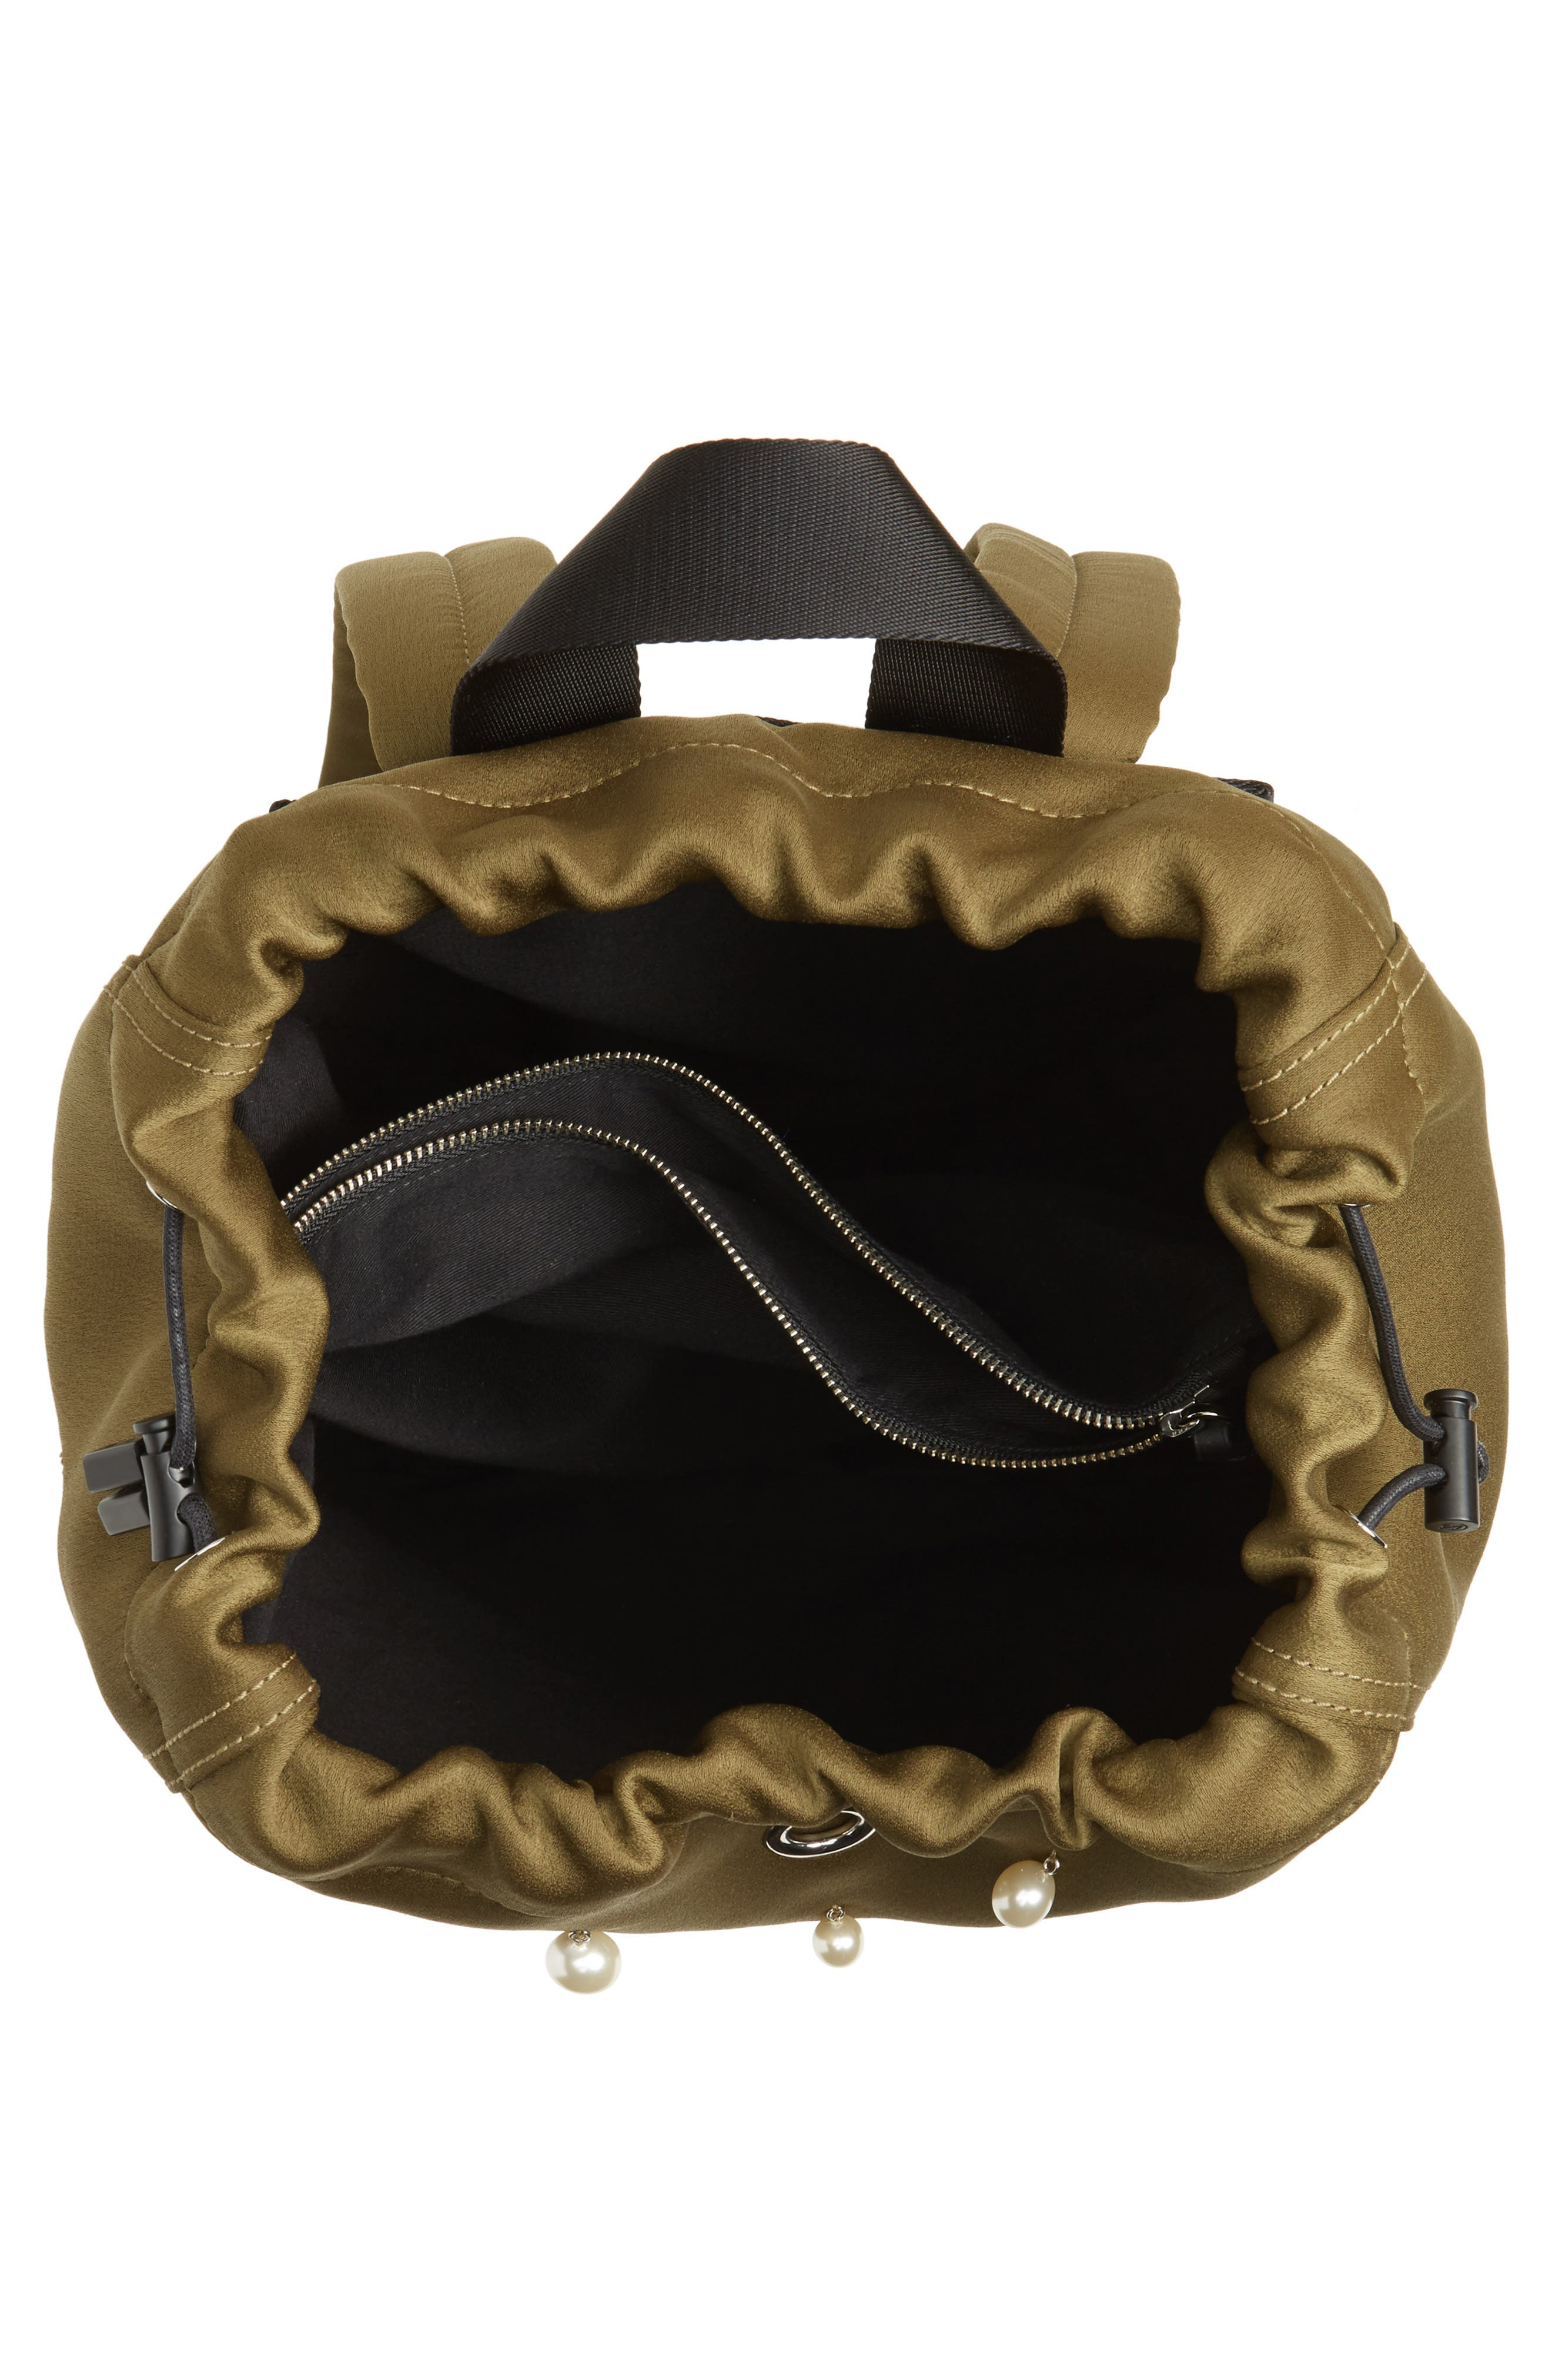 Phillip Lim 3.1 Medium Go-Go Embellished Backpack,                             Alternate thumbnail 4, color,                             301